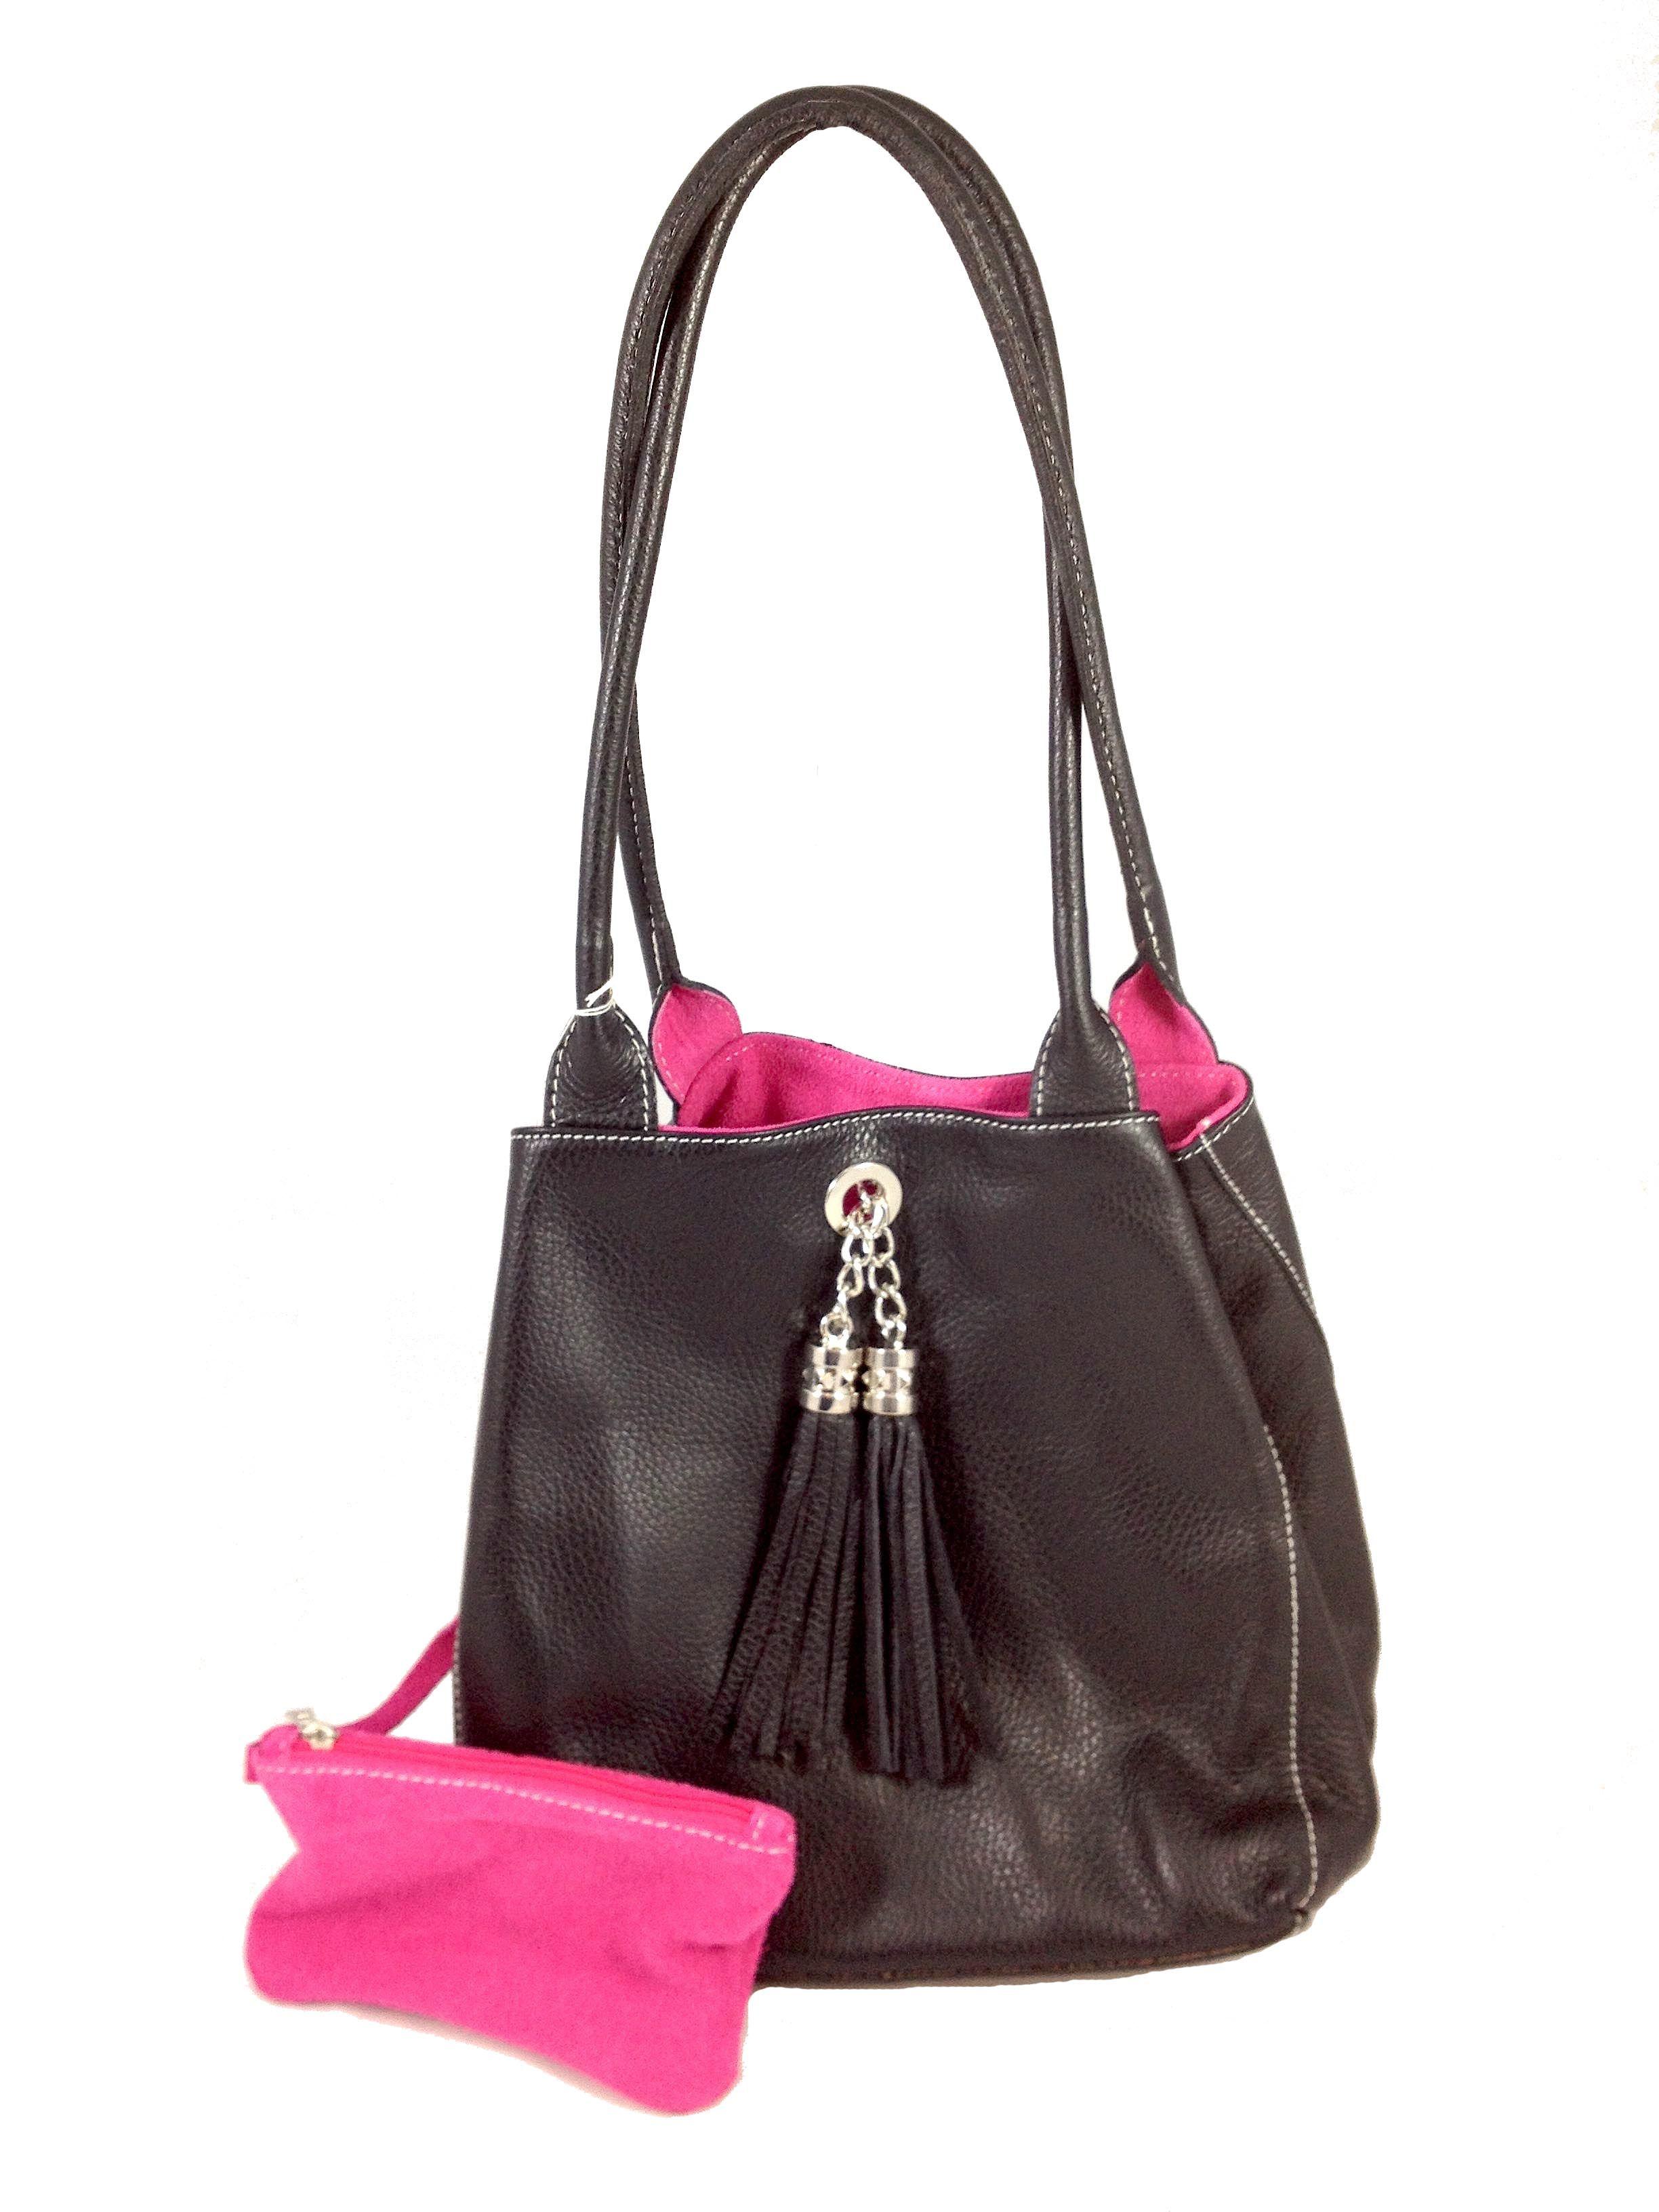 Lyn Reversible Italian Leather Handbag Black Fuchsia Suede